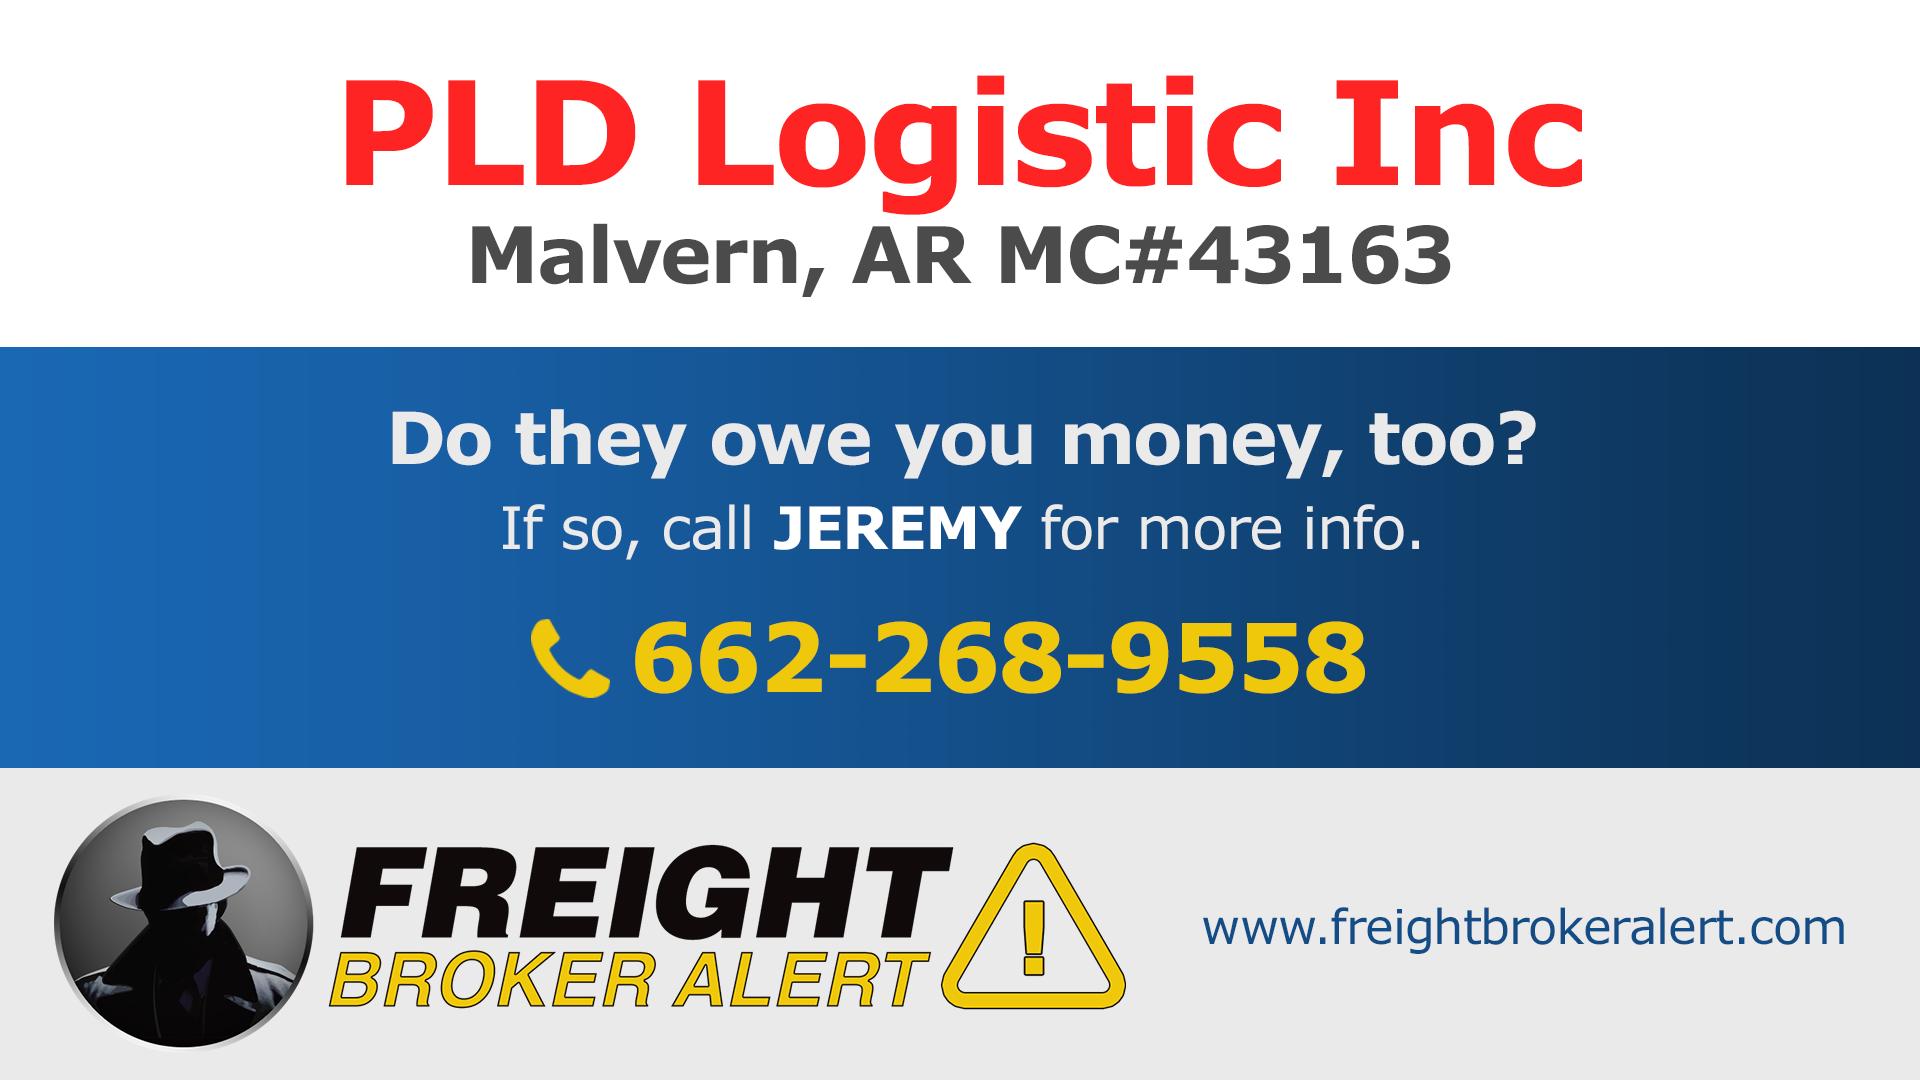 PLD Logistic Inc Arkansas